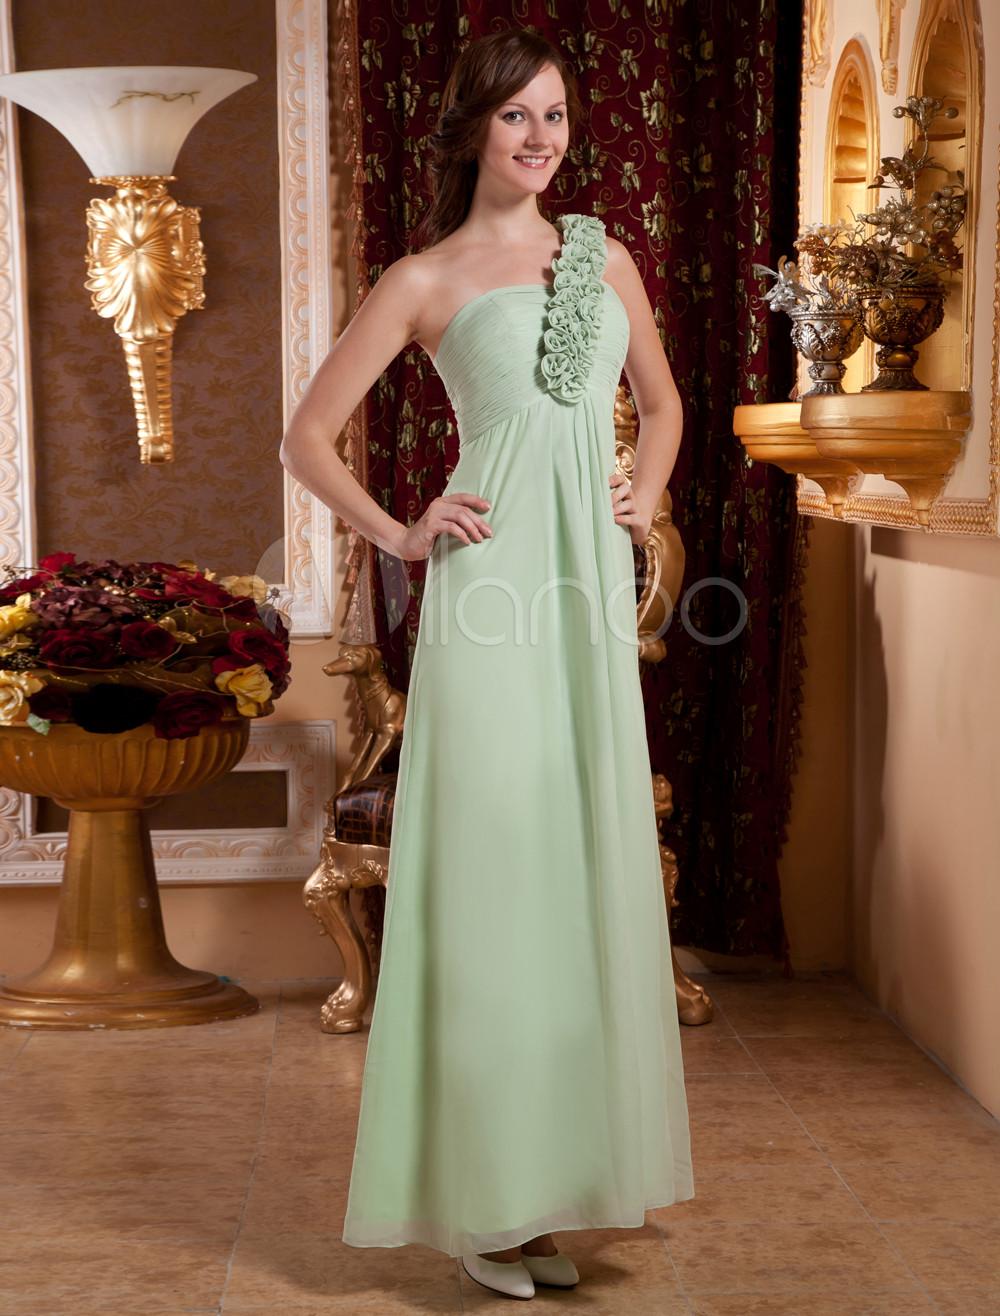 Green Flower One-Shoulder Chiffon Woman's Bridesmaid Dress